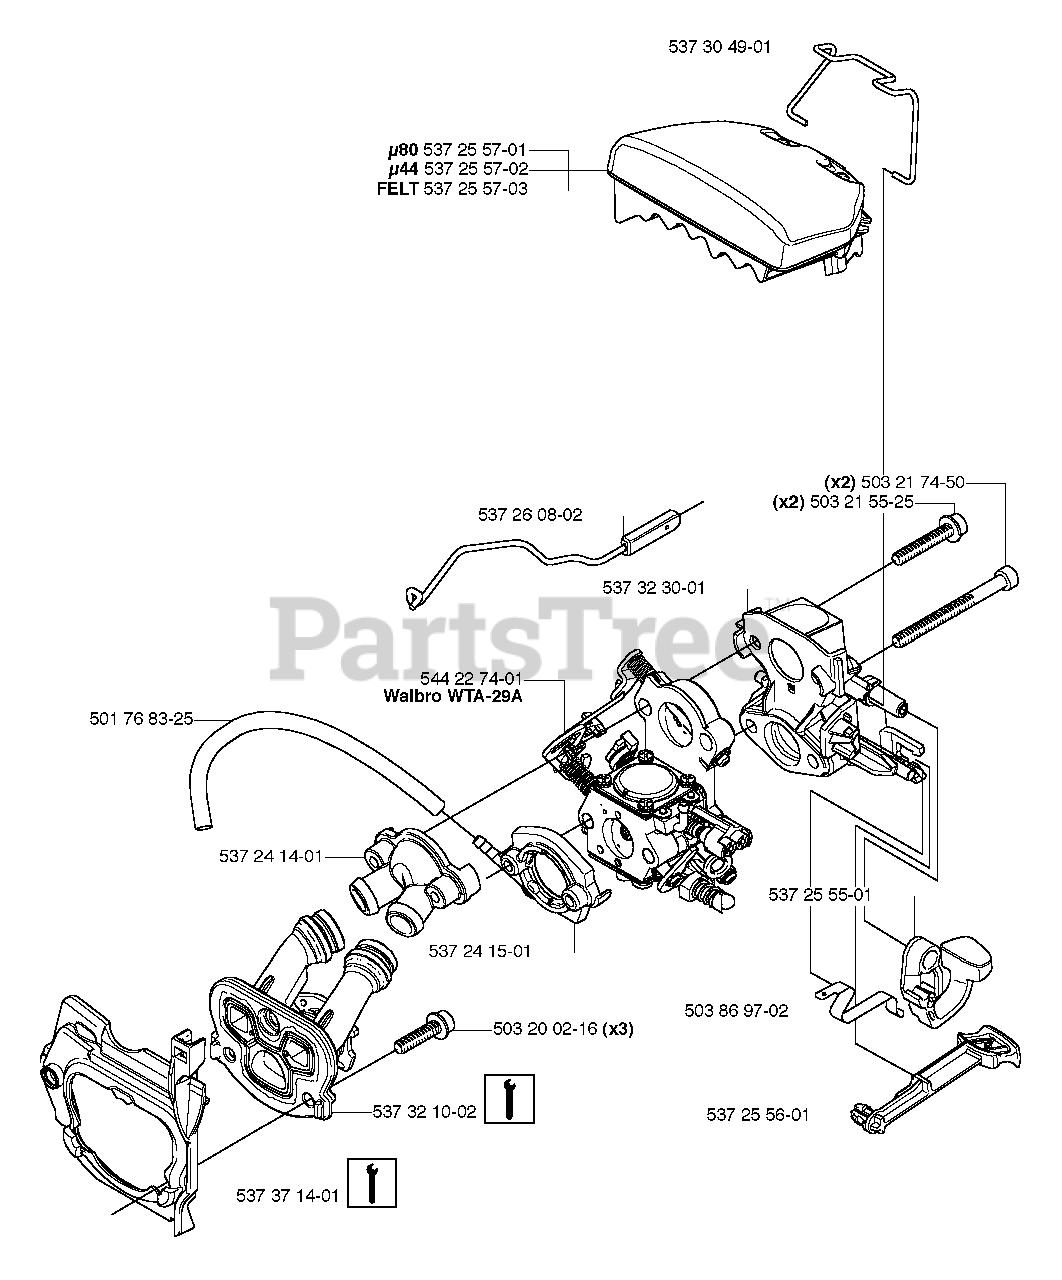 Husqvarna Parts on the Air Filter / Carburetor Diagram for